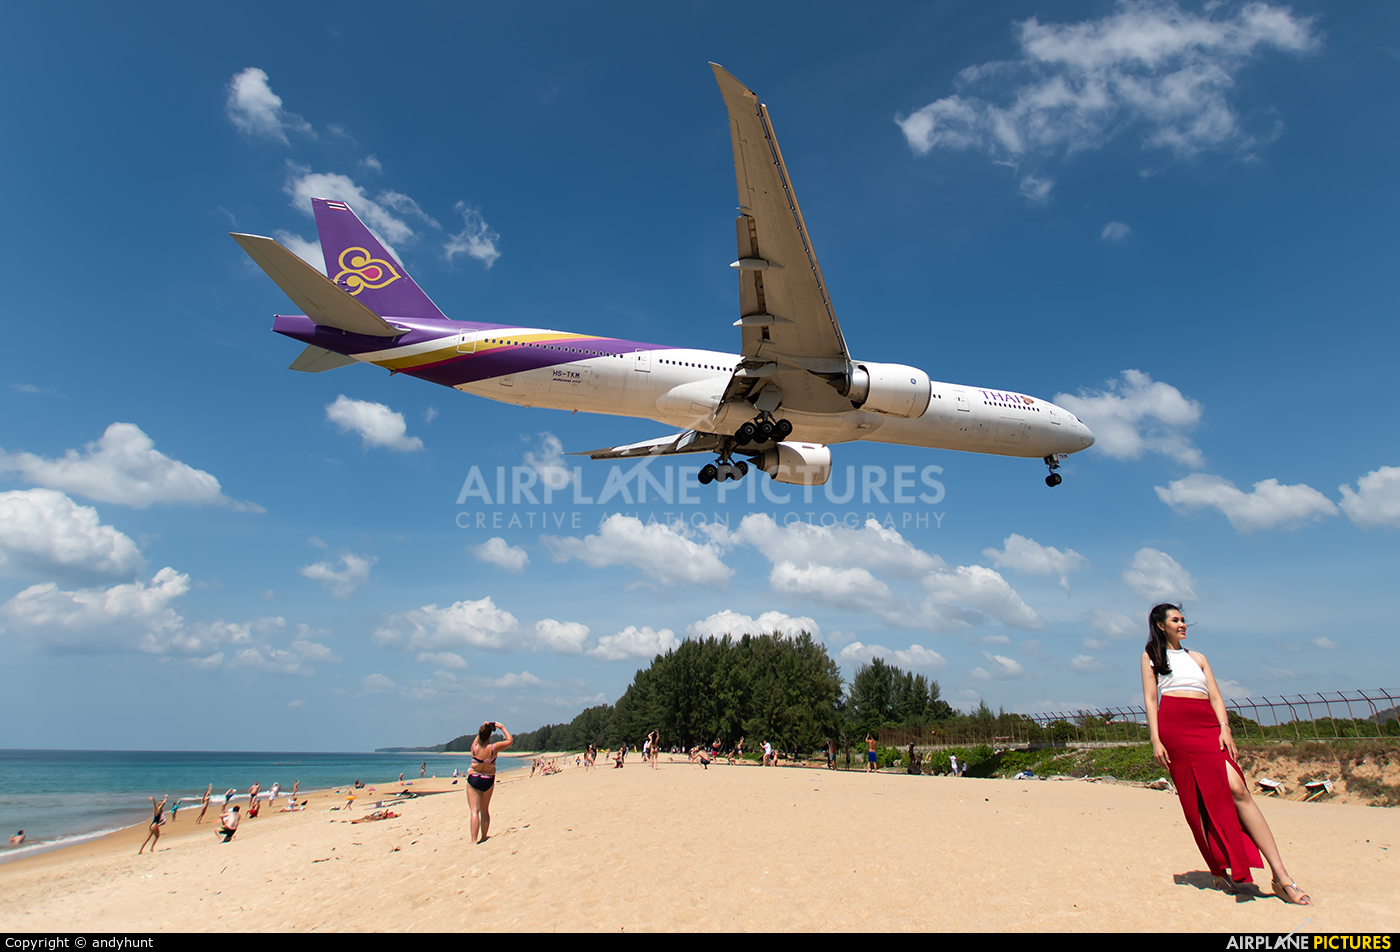 Thai Airways HS-TKM aircraft at Phuket